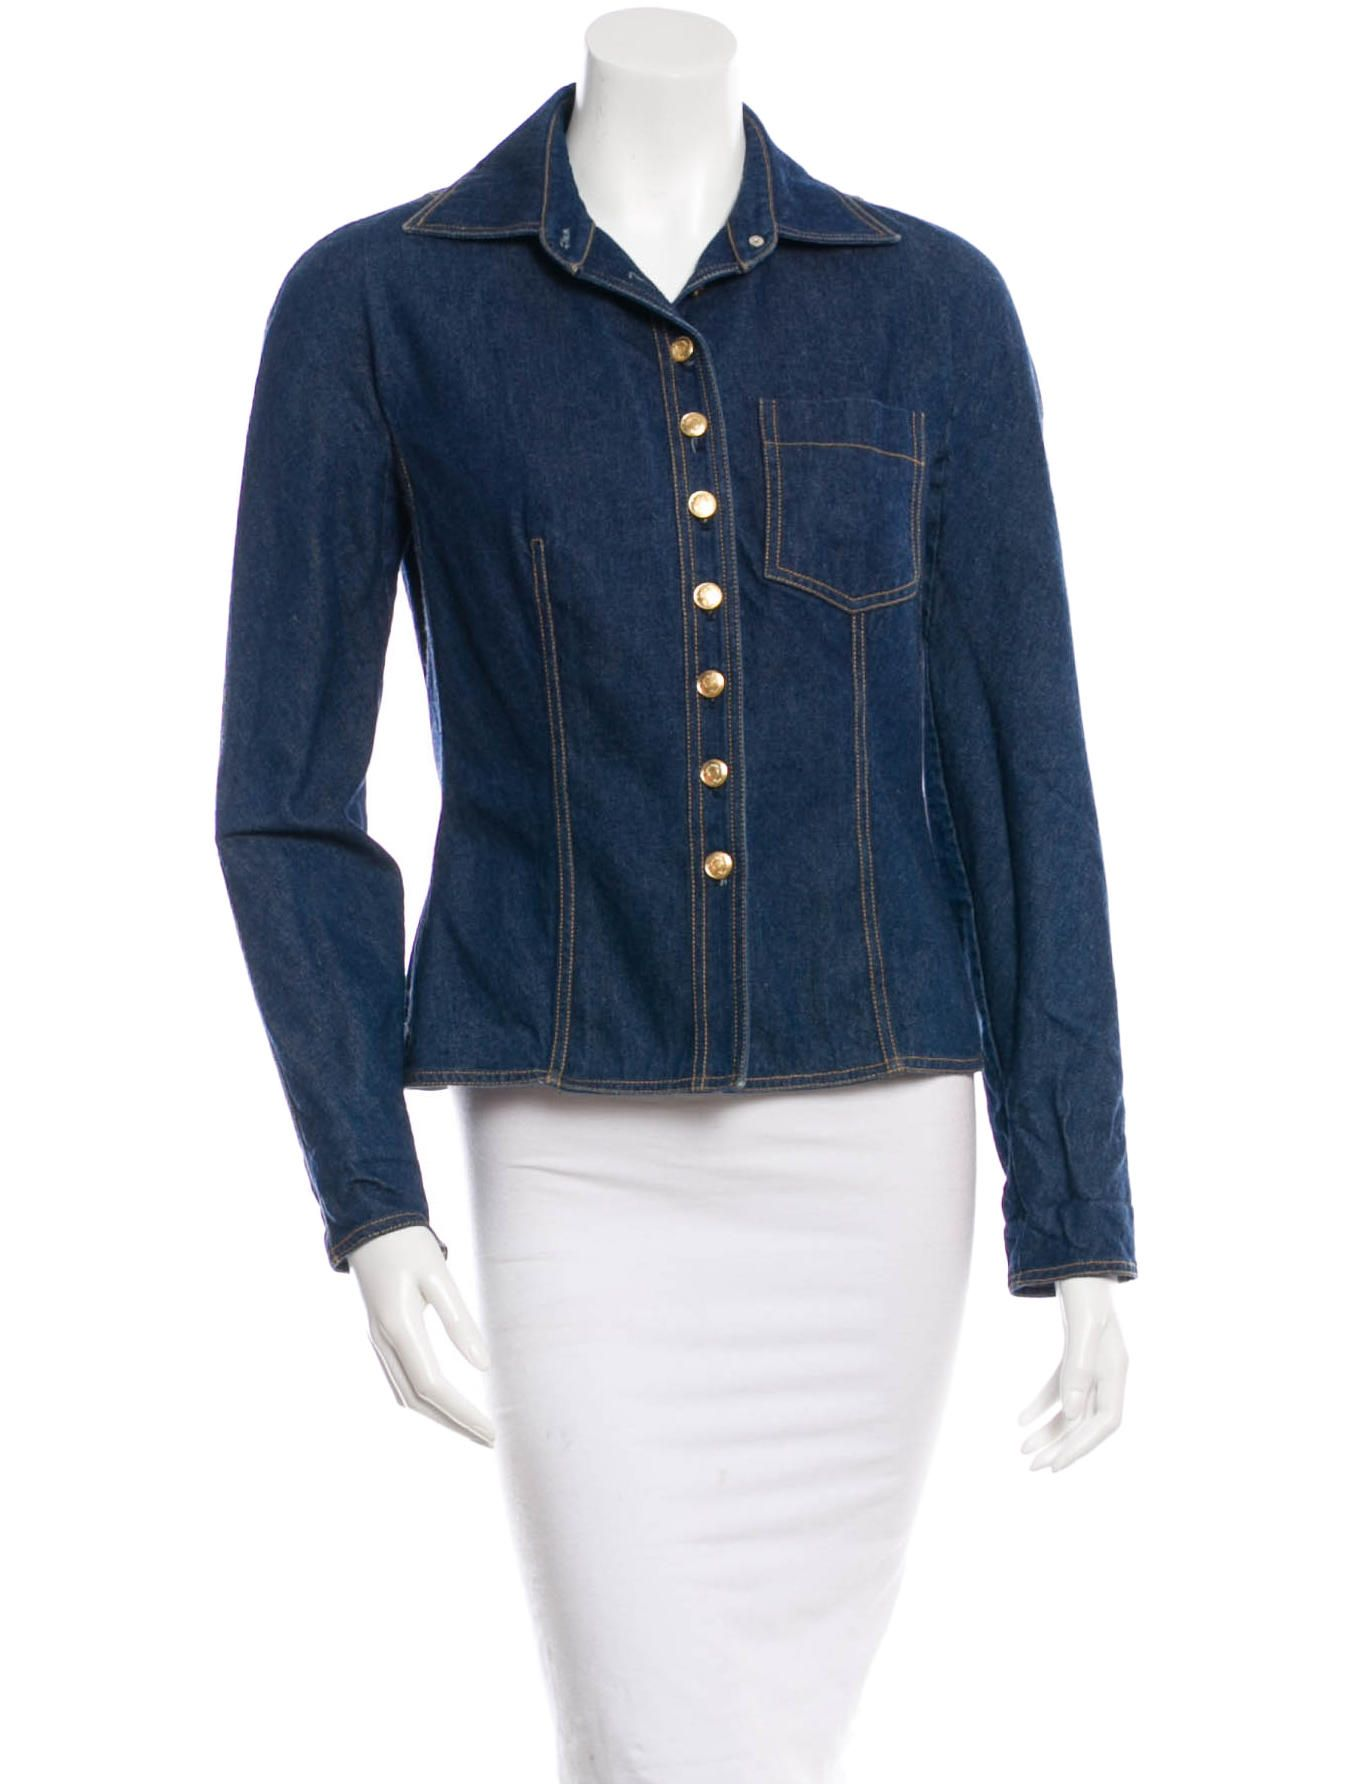 Blue Denim Christian Dior Jacket With Wing Collar Single Patch Pocket At Bust Long Sleeve Denim Jacket Jackets Denim [ 1784 x 1352 Pixel ]